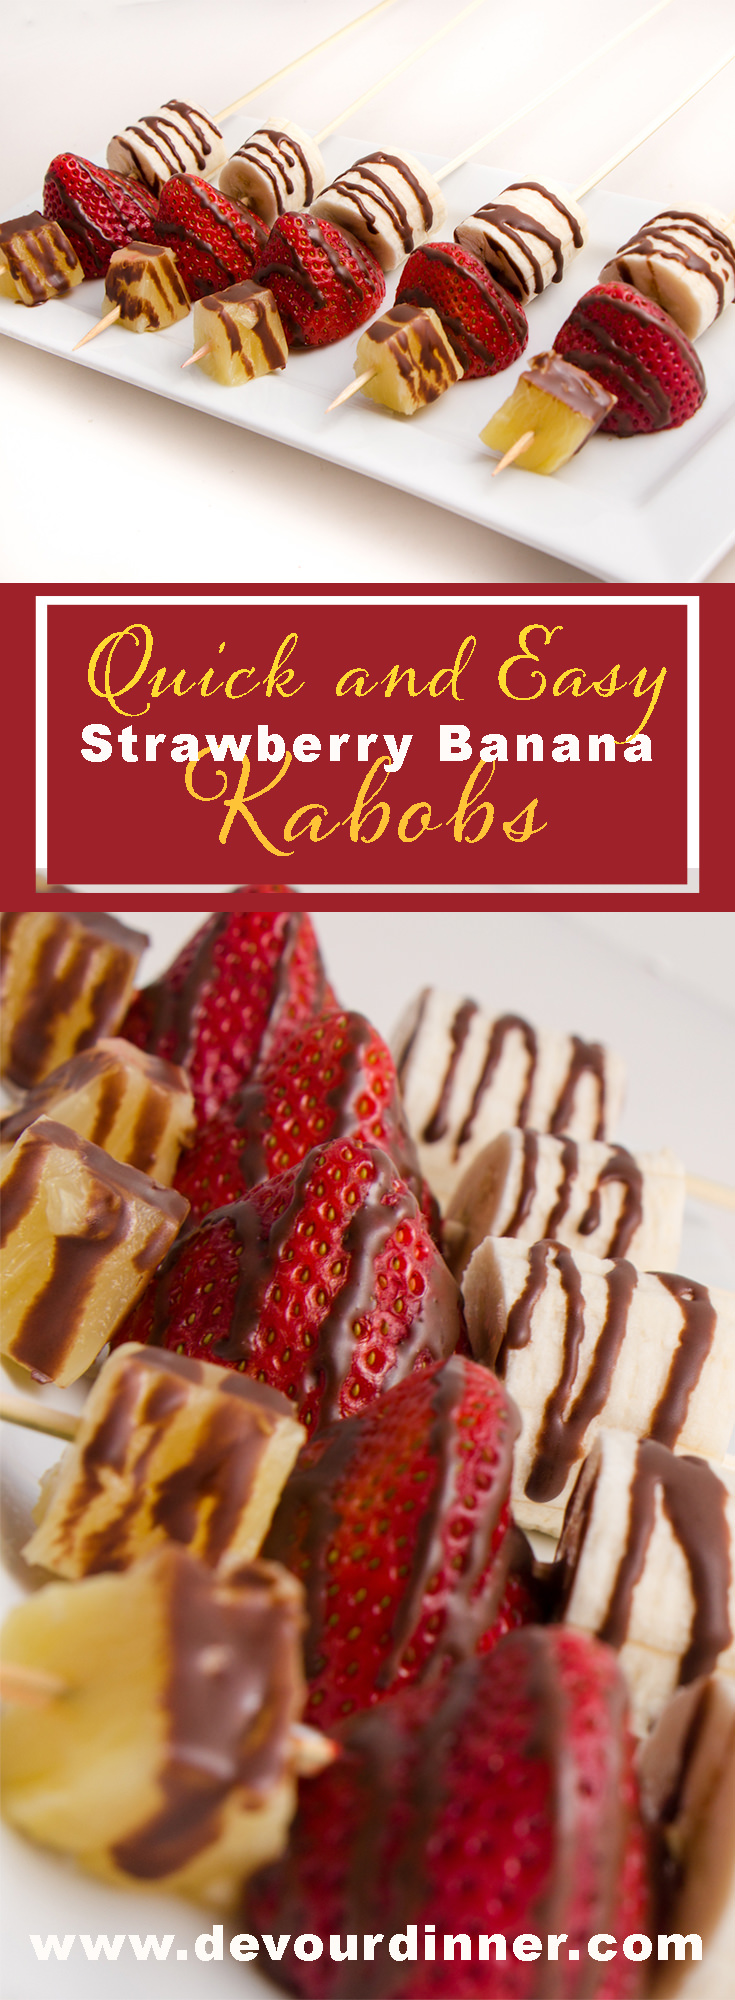 Banana Split Kabob - Devour Dinner - Appetizer, Dessert, Side dish. Food on a Stick is Great! #Appetizer #recipe #Dessert #BananaSplit #Delicious #Yummy #Recipe #Recipes #Food #foodie #Devourdinner #Foodblogger #Buzzfeast